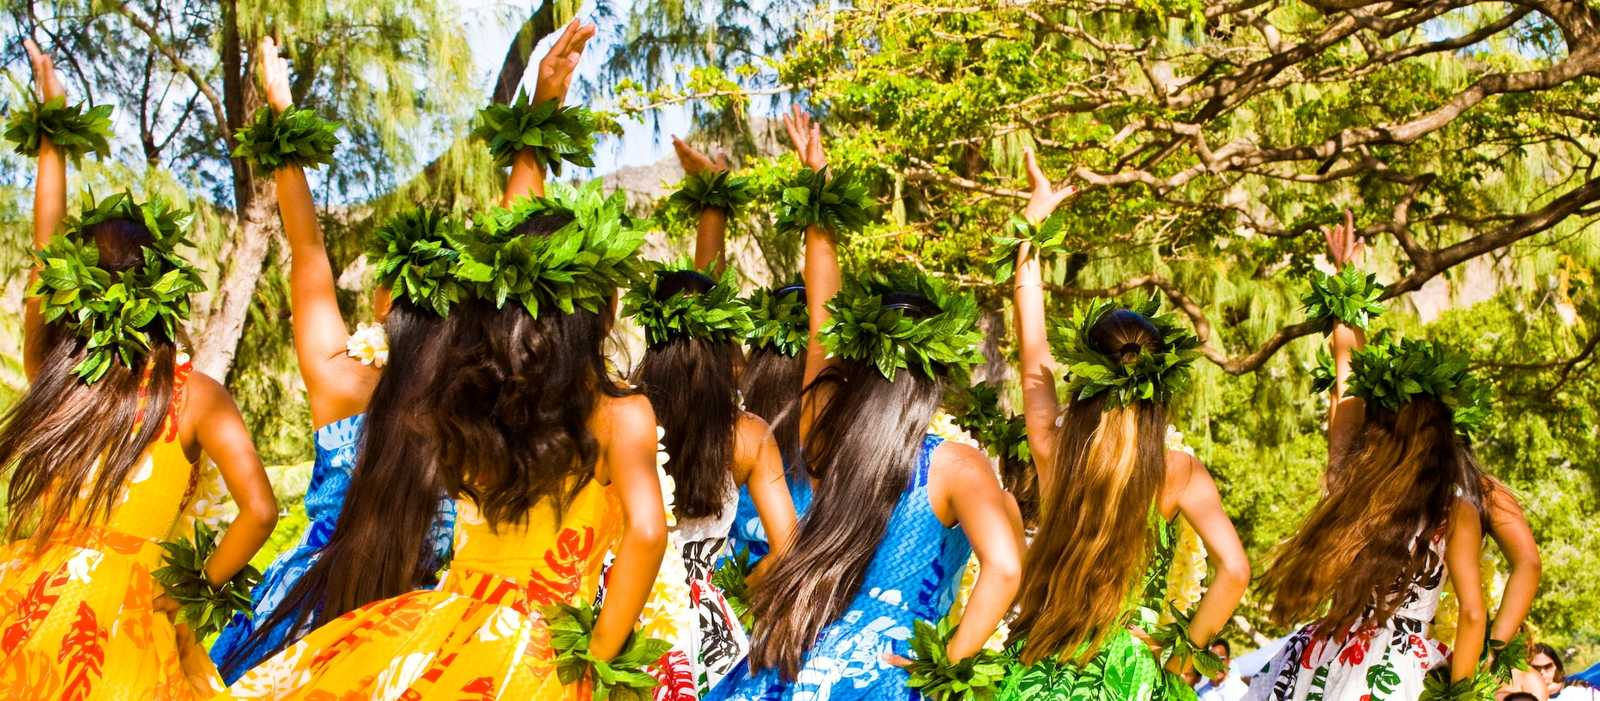 Hula tanzen am Lei day festival